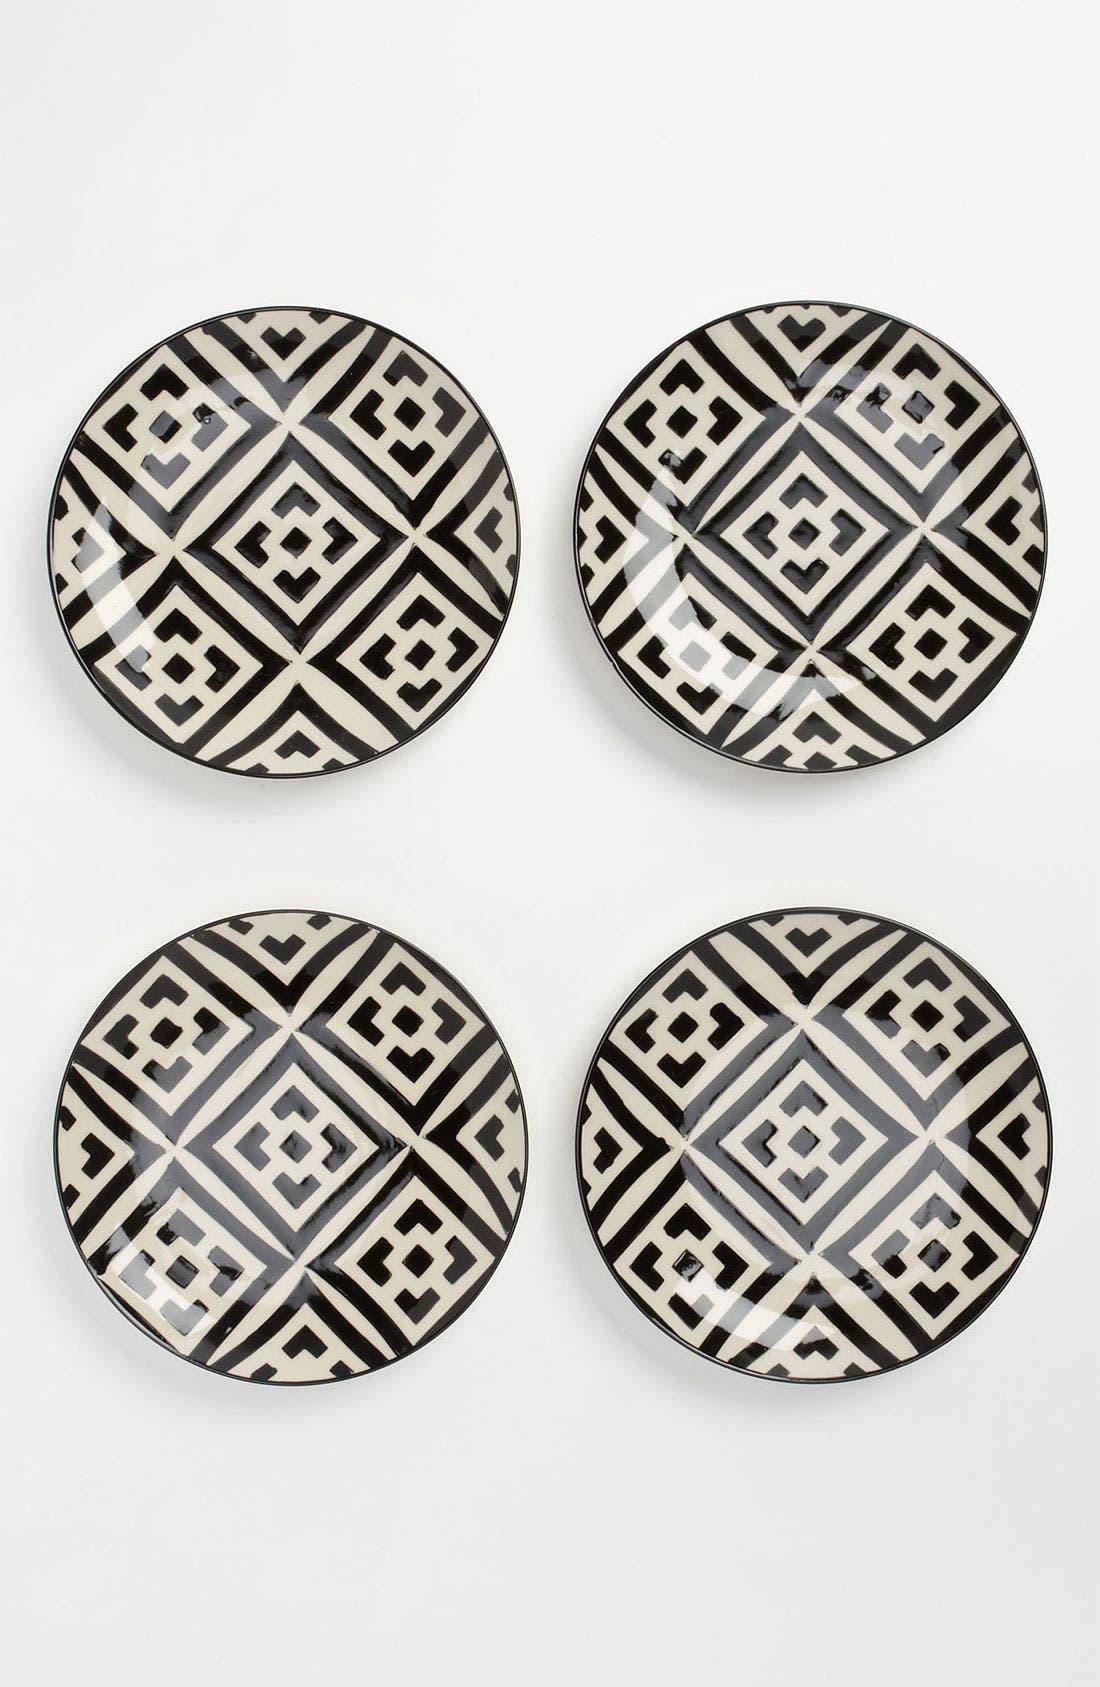 Main Image - Black & White Dessert Plates (Set of 4)